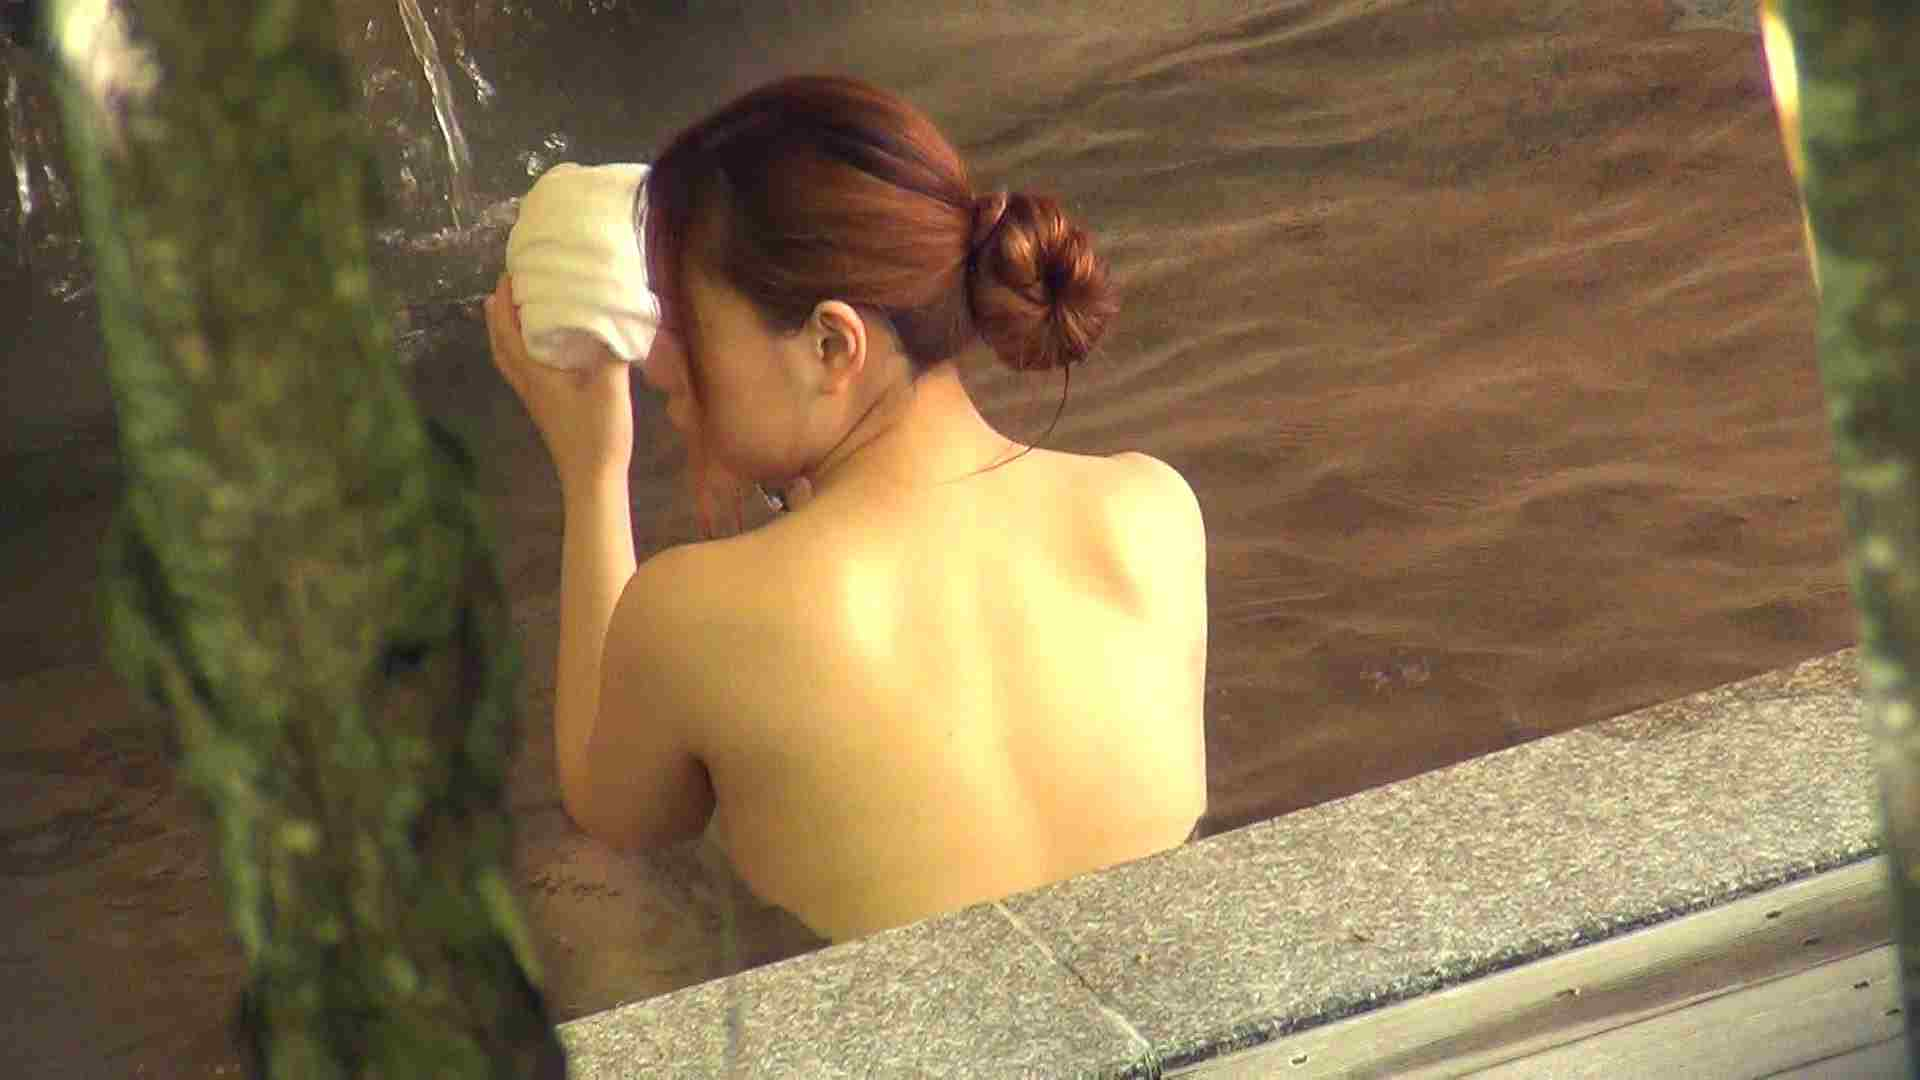 Aquaな露天風呂Vol.270 盗撮 エロ画像 74連発 26